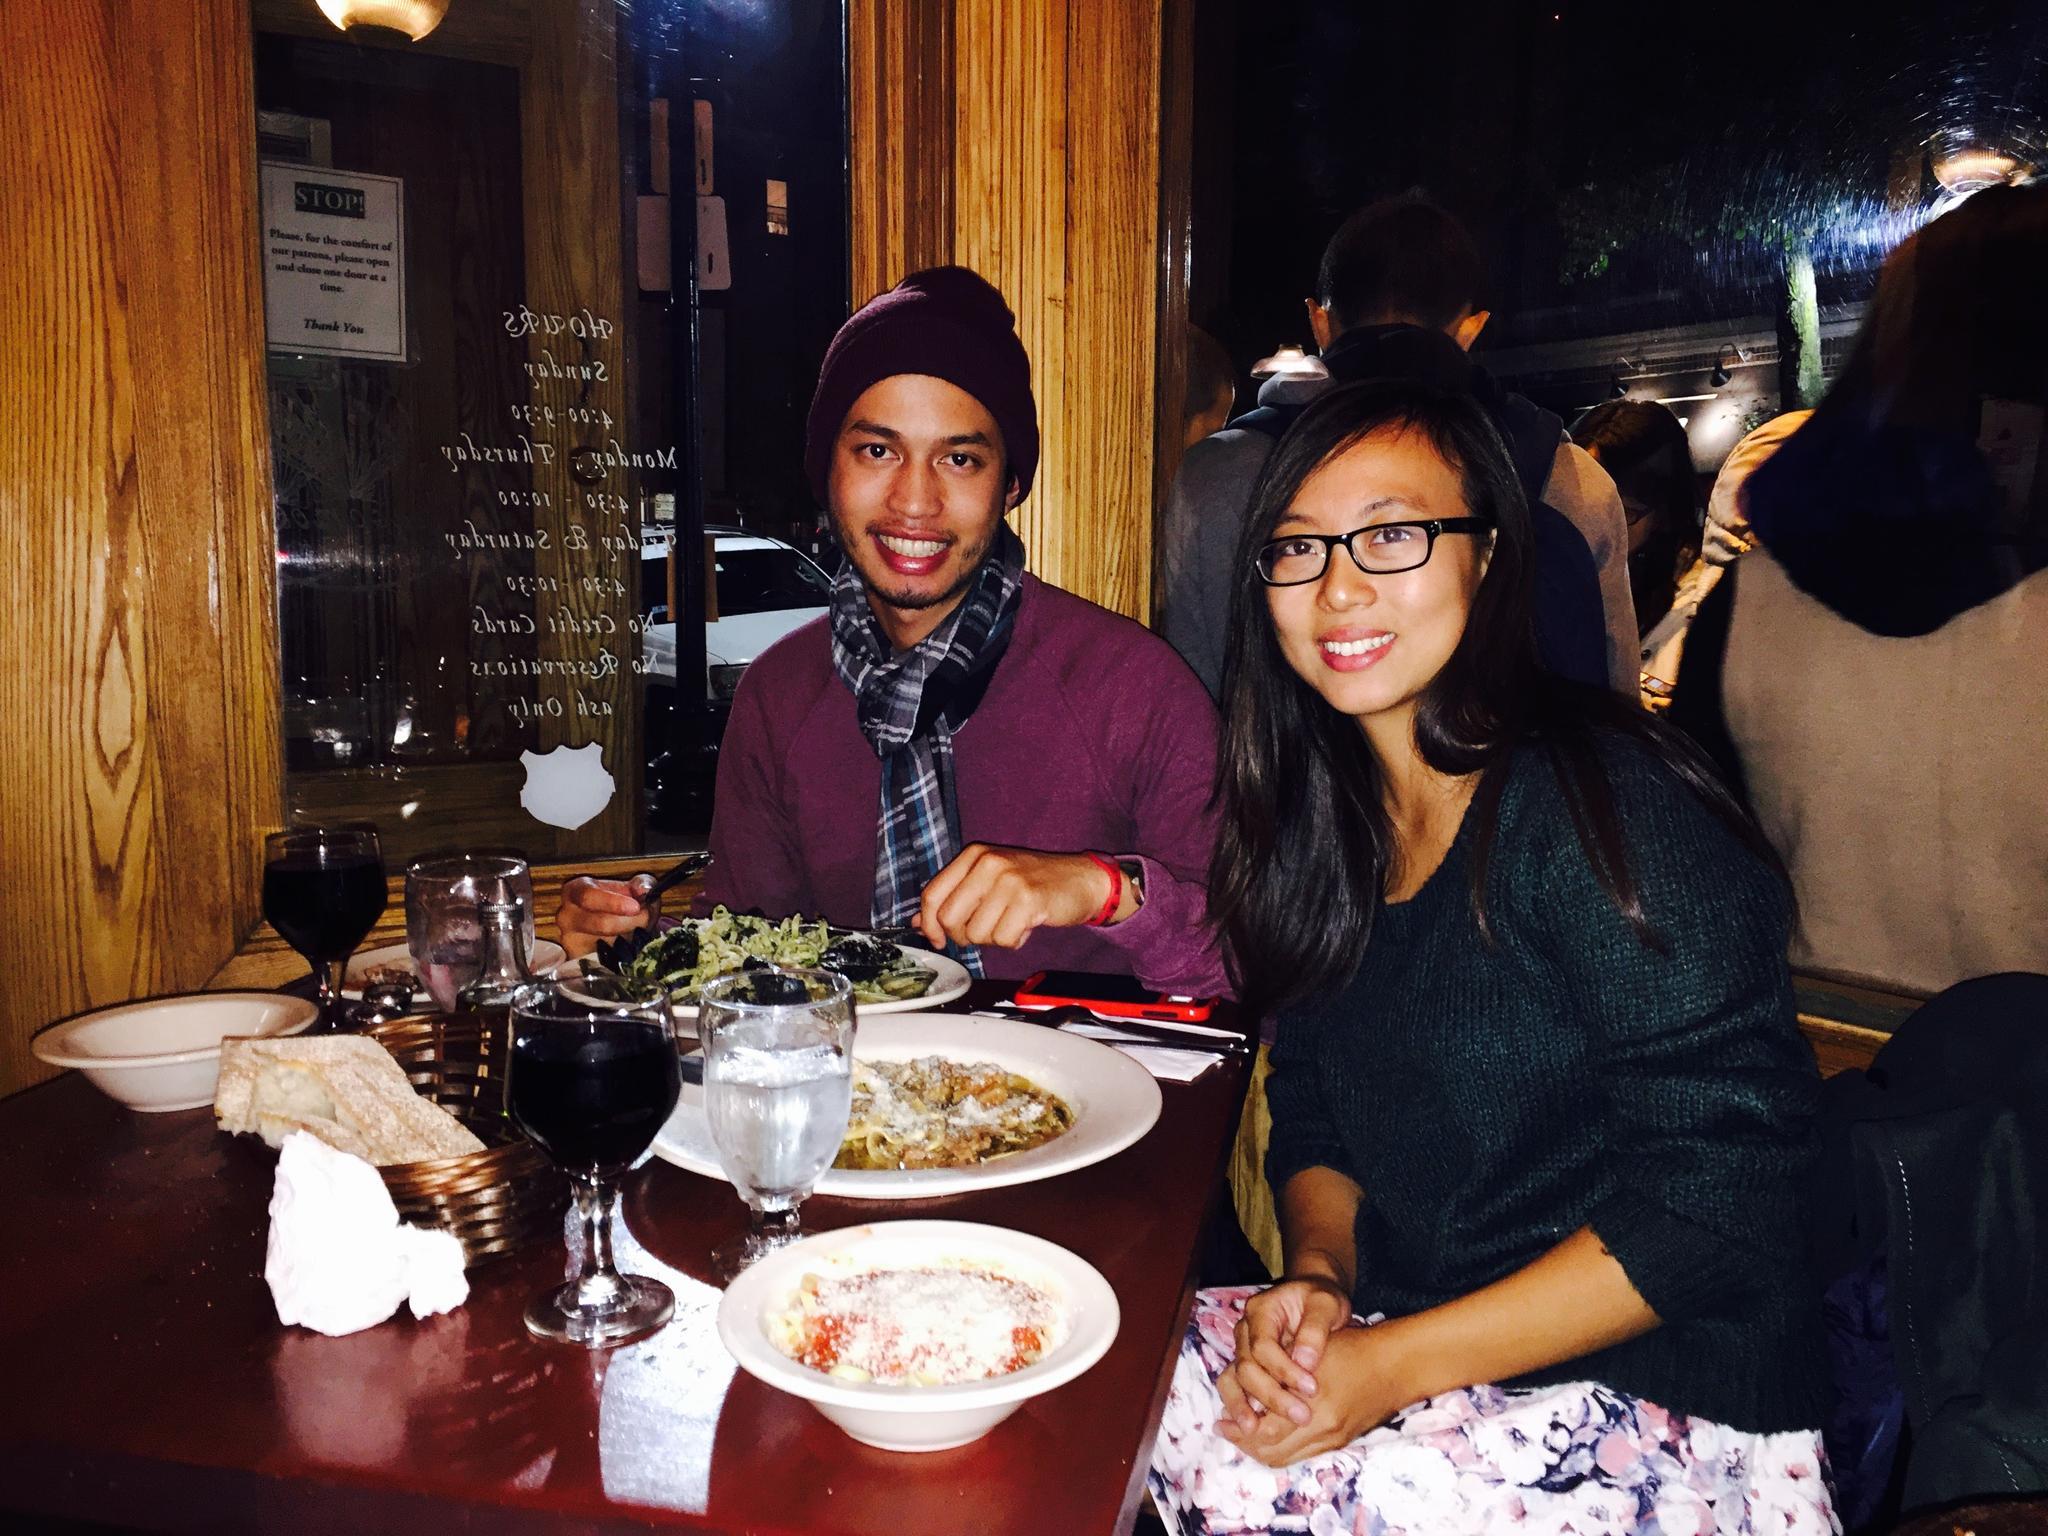 Little Italy in Boston, November 2015